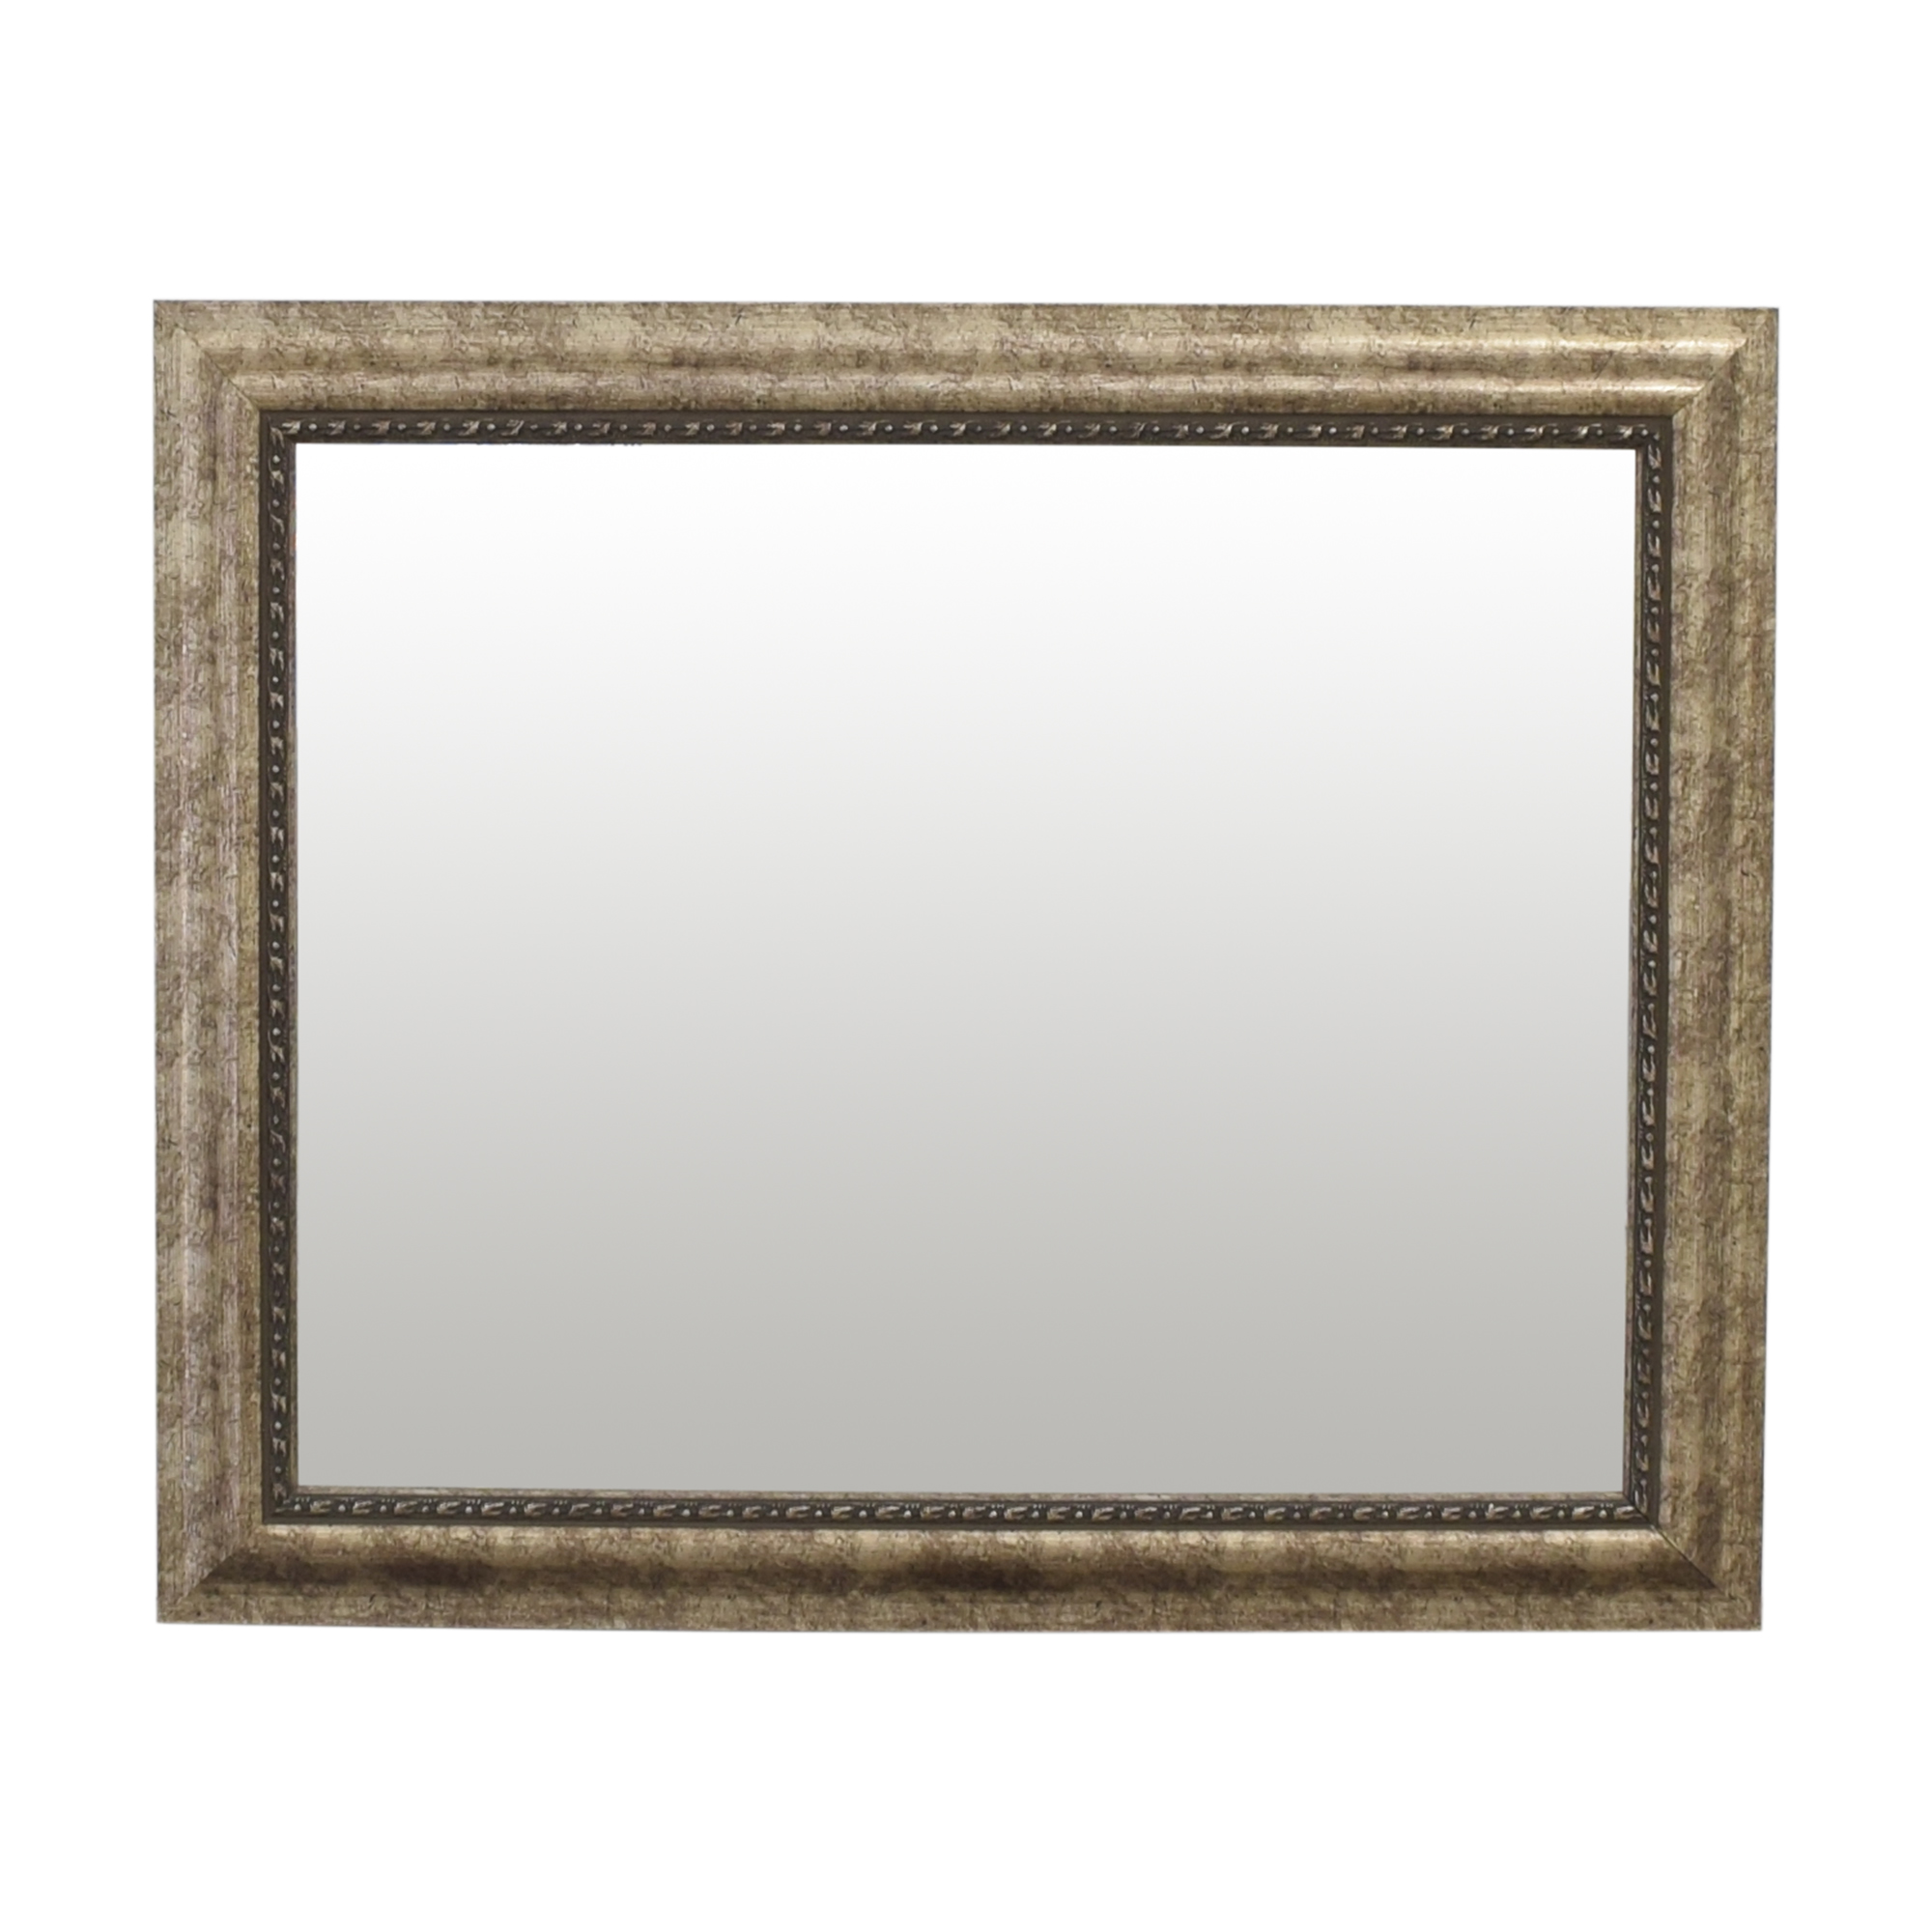 Bed Bath & Beyond Bed Bath & Beyond Framed Wall Mirror dimensions